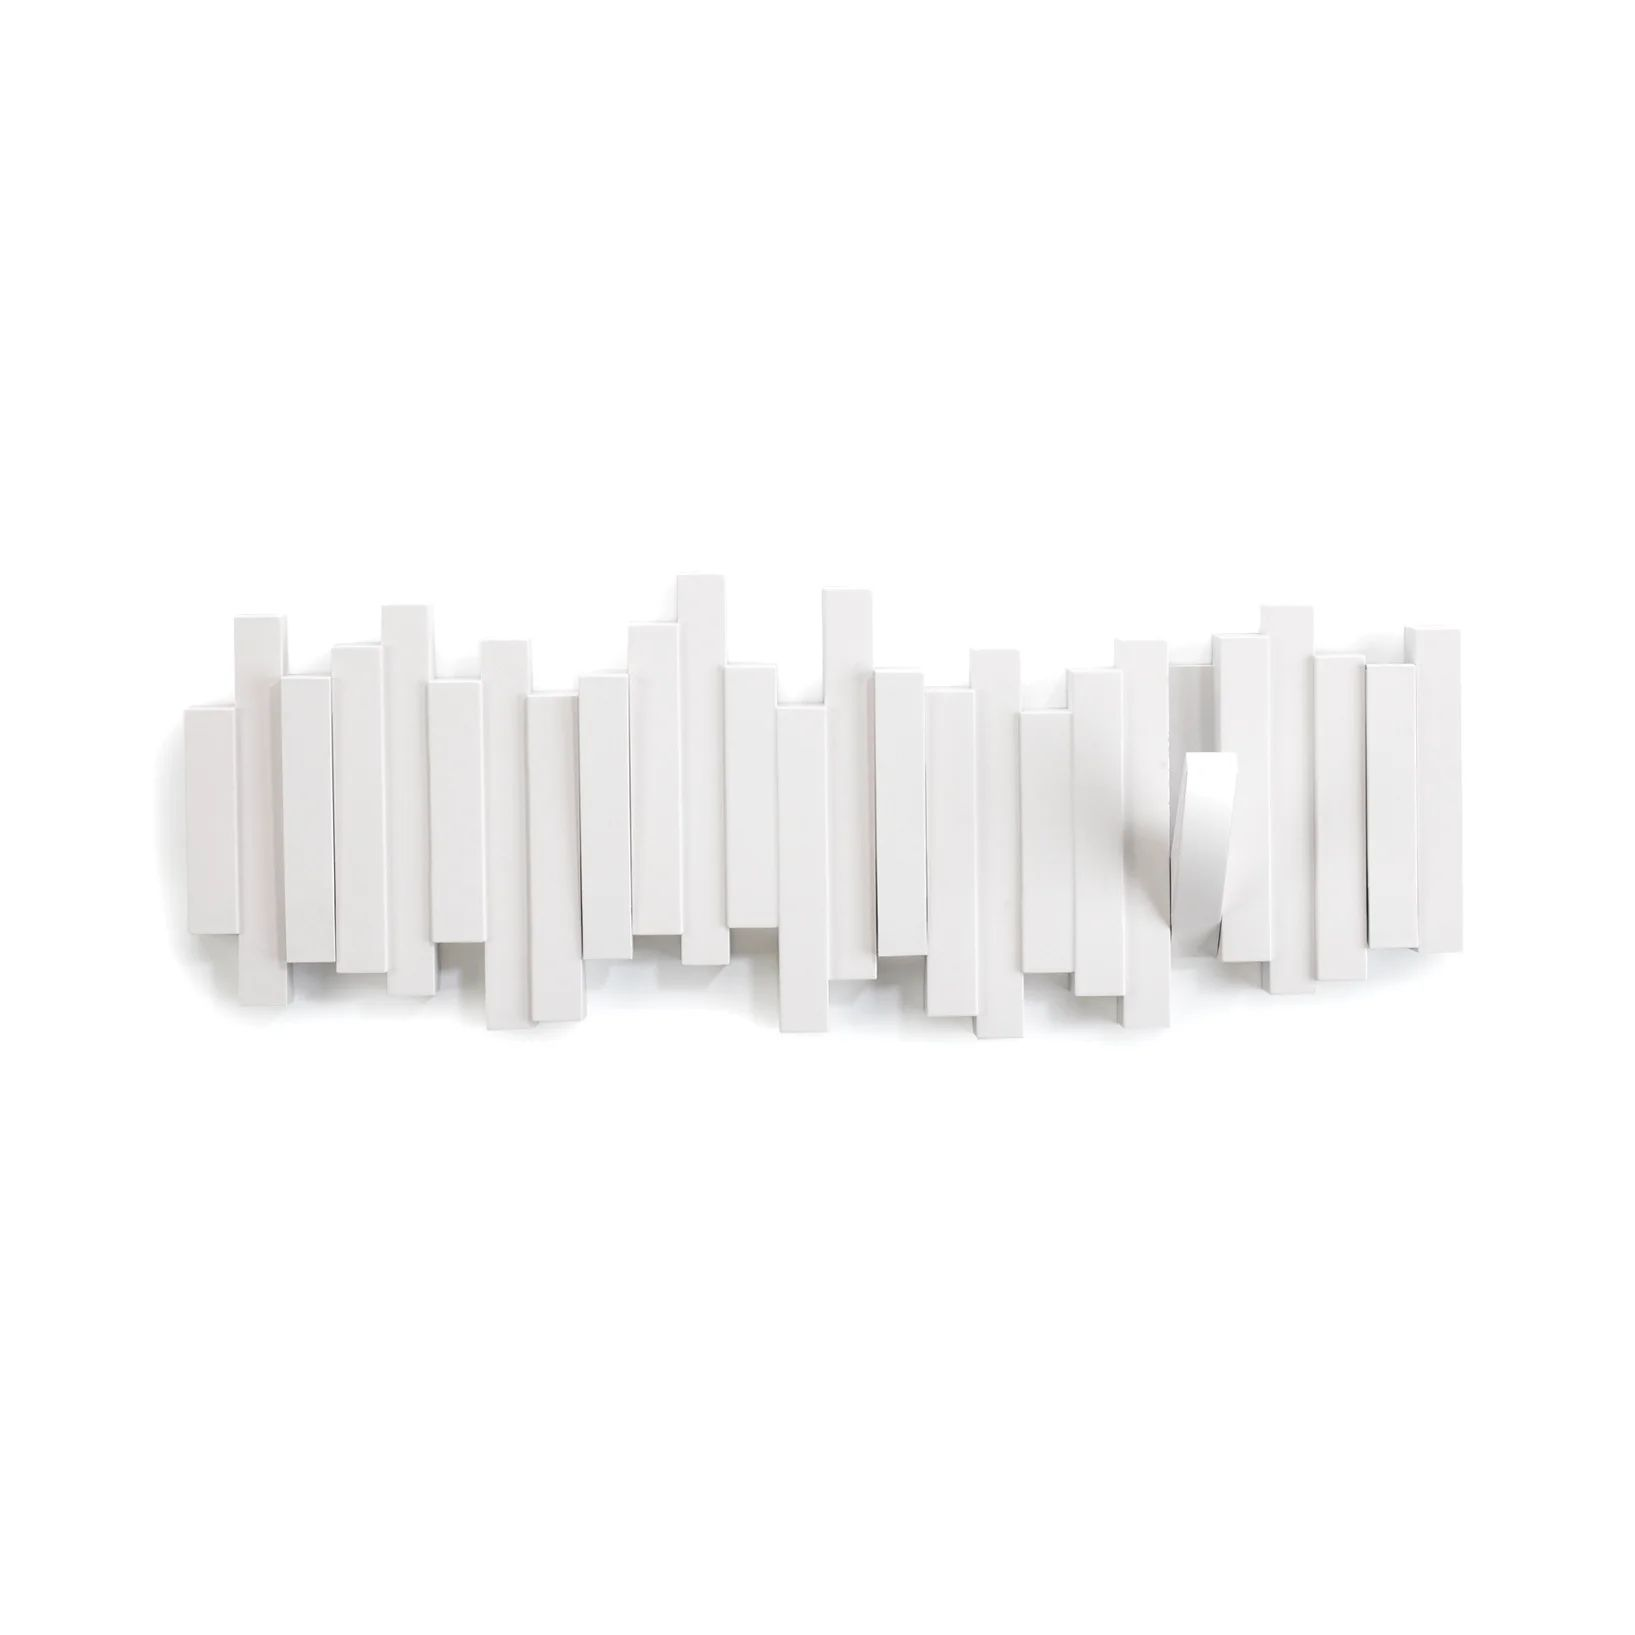 Patere Umbra Sticks 5 Pateres A Visser Blanc Leroy Merlin